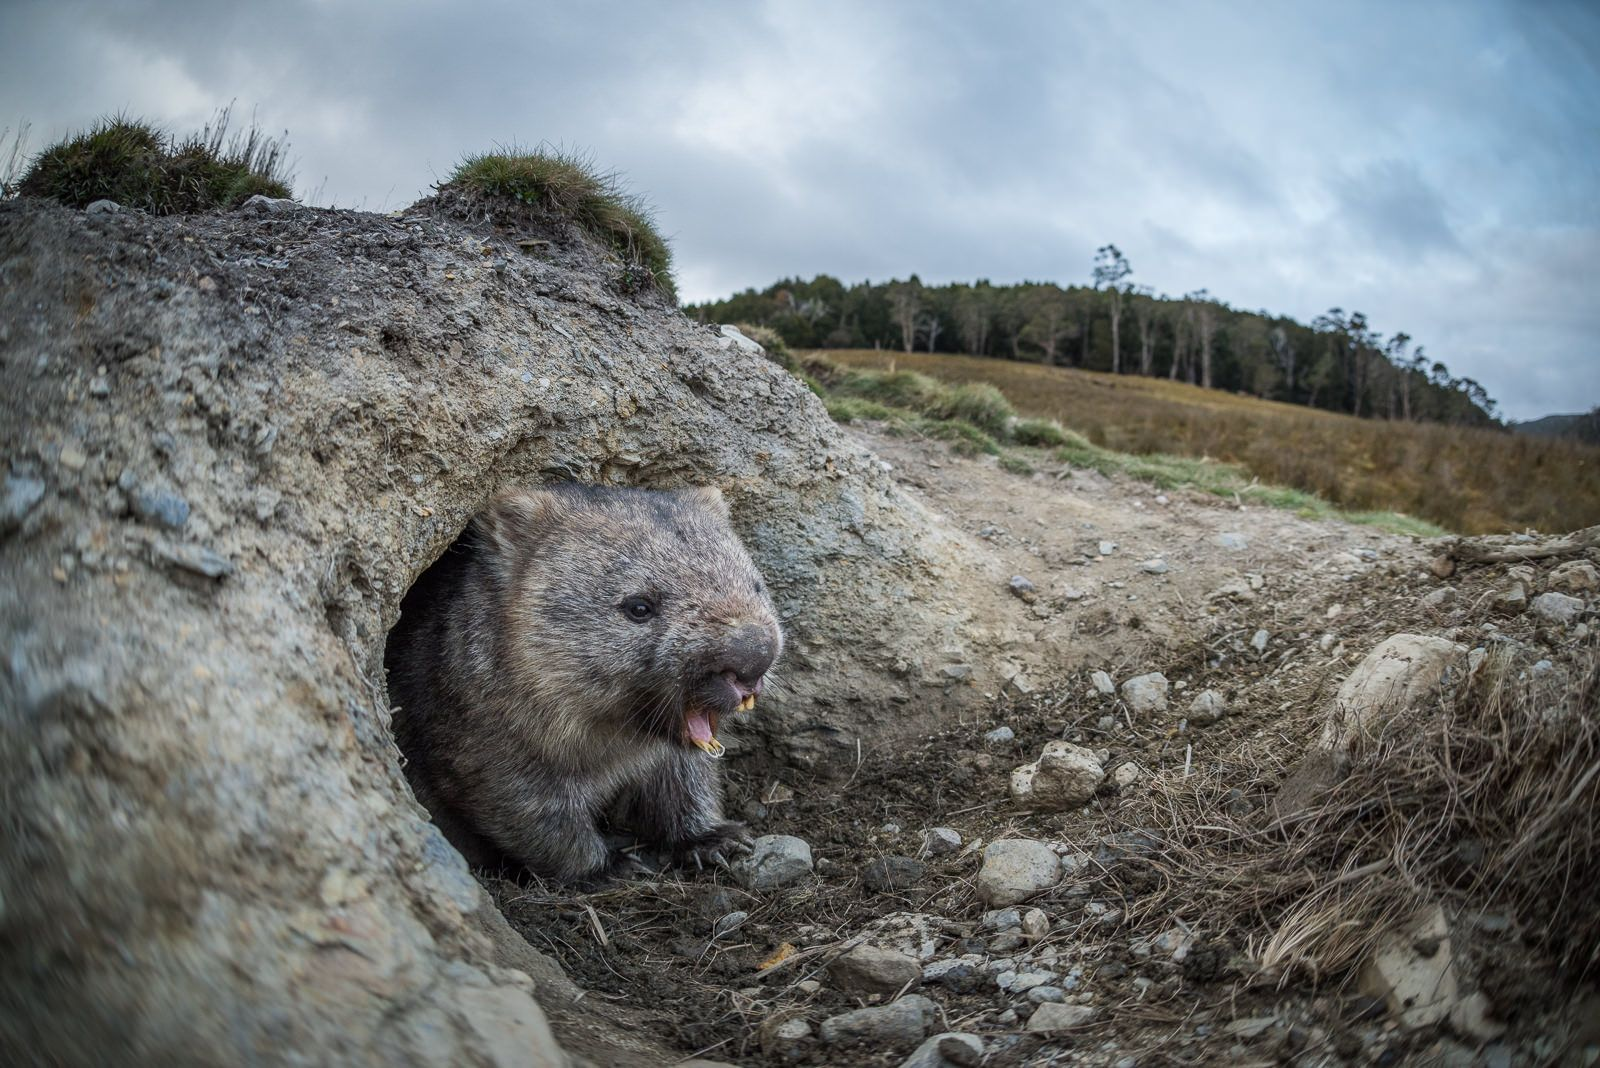 Wombat Emerging From Burrow © Sean Crane